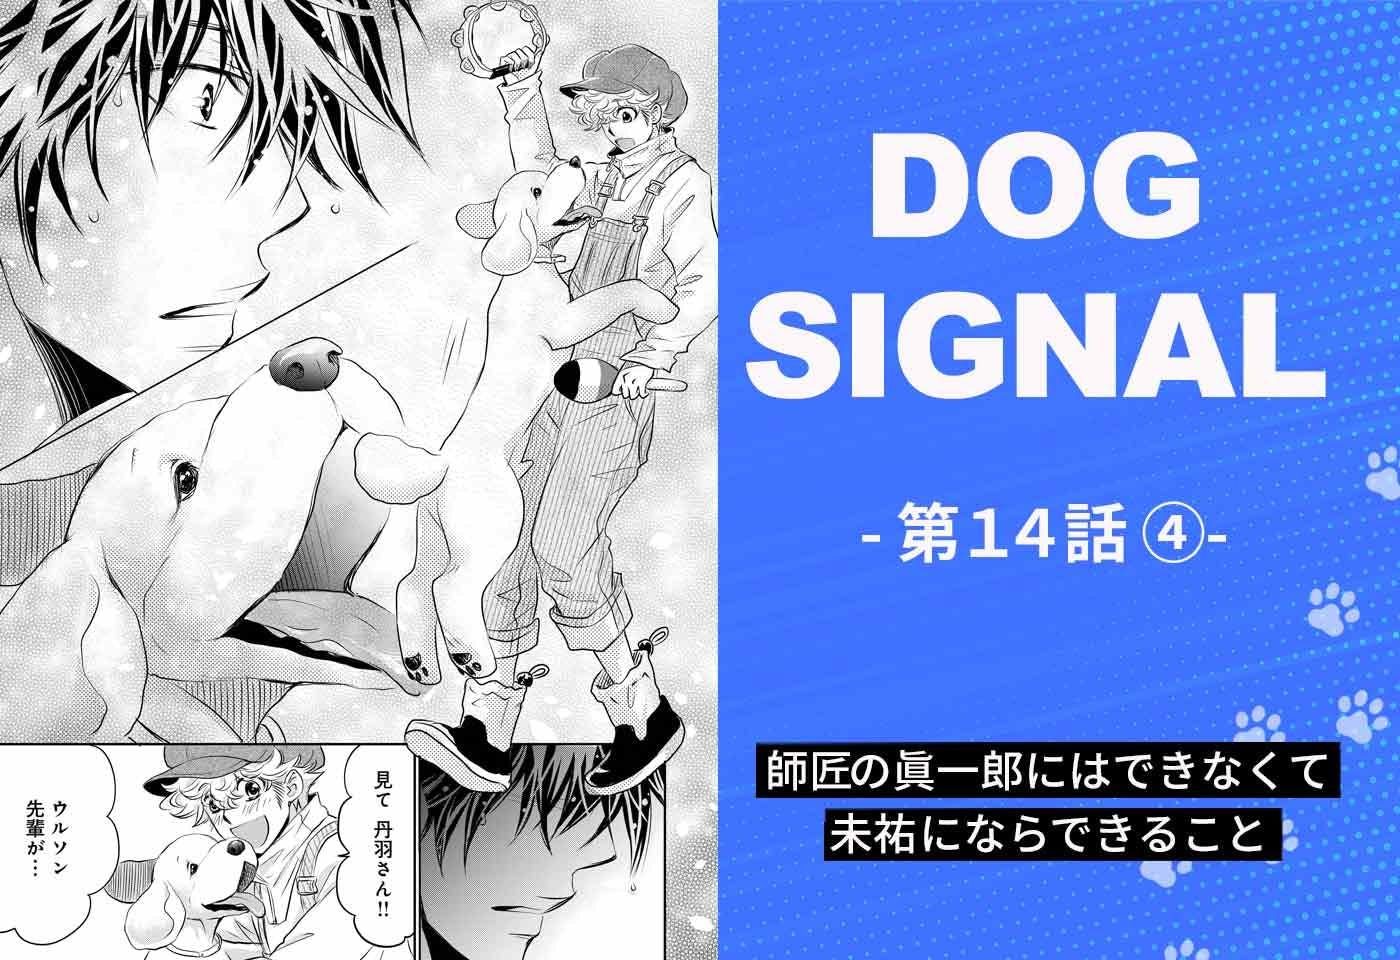 『DOG SIGNAL』14話目 4/4